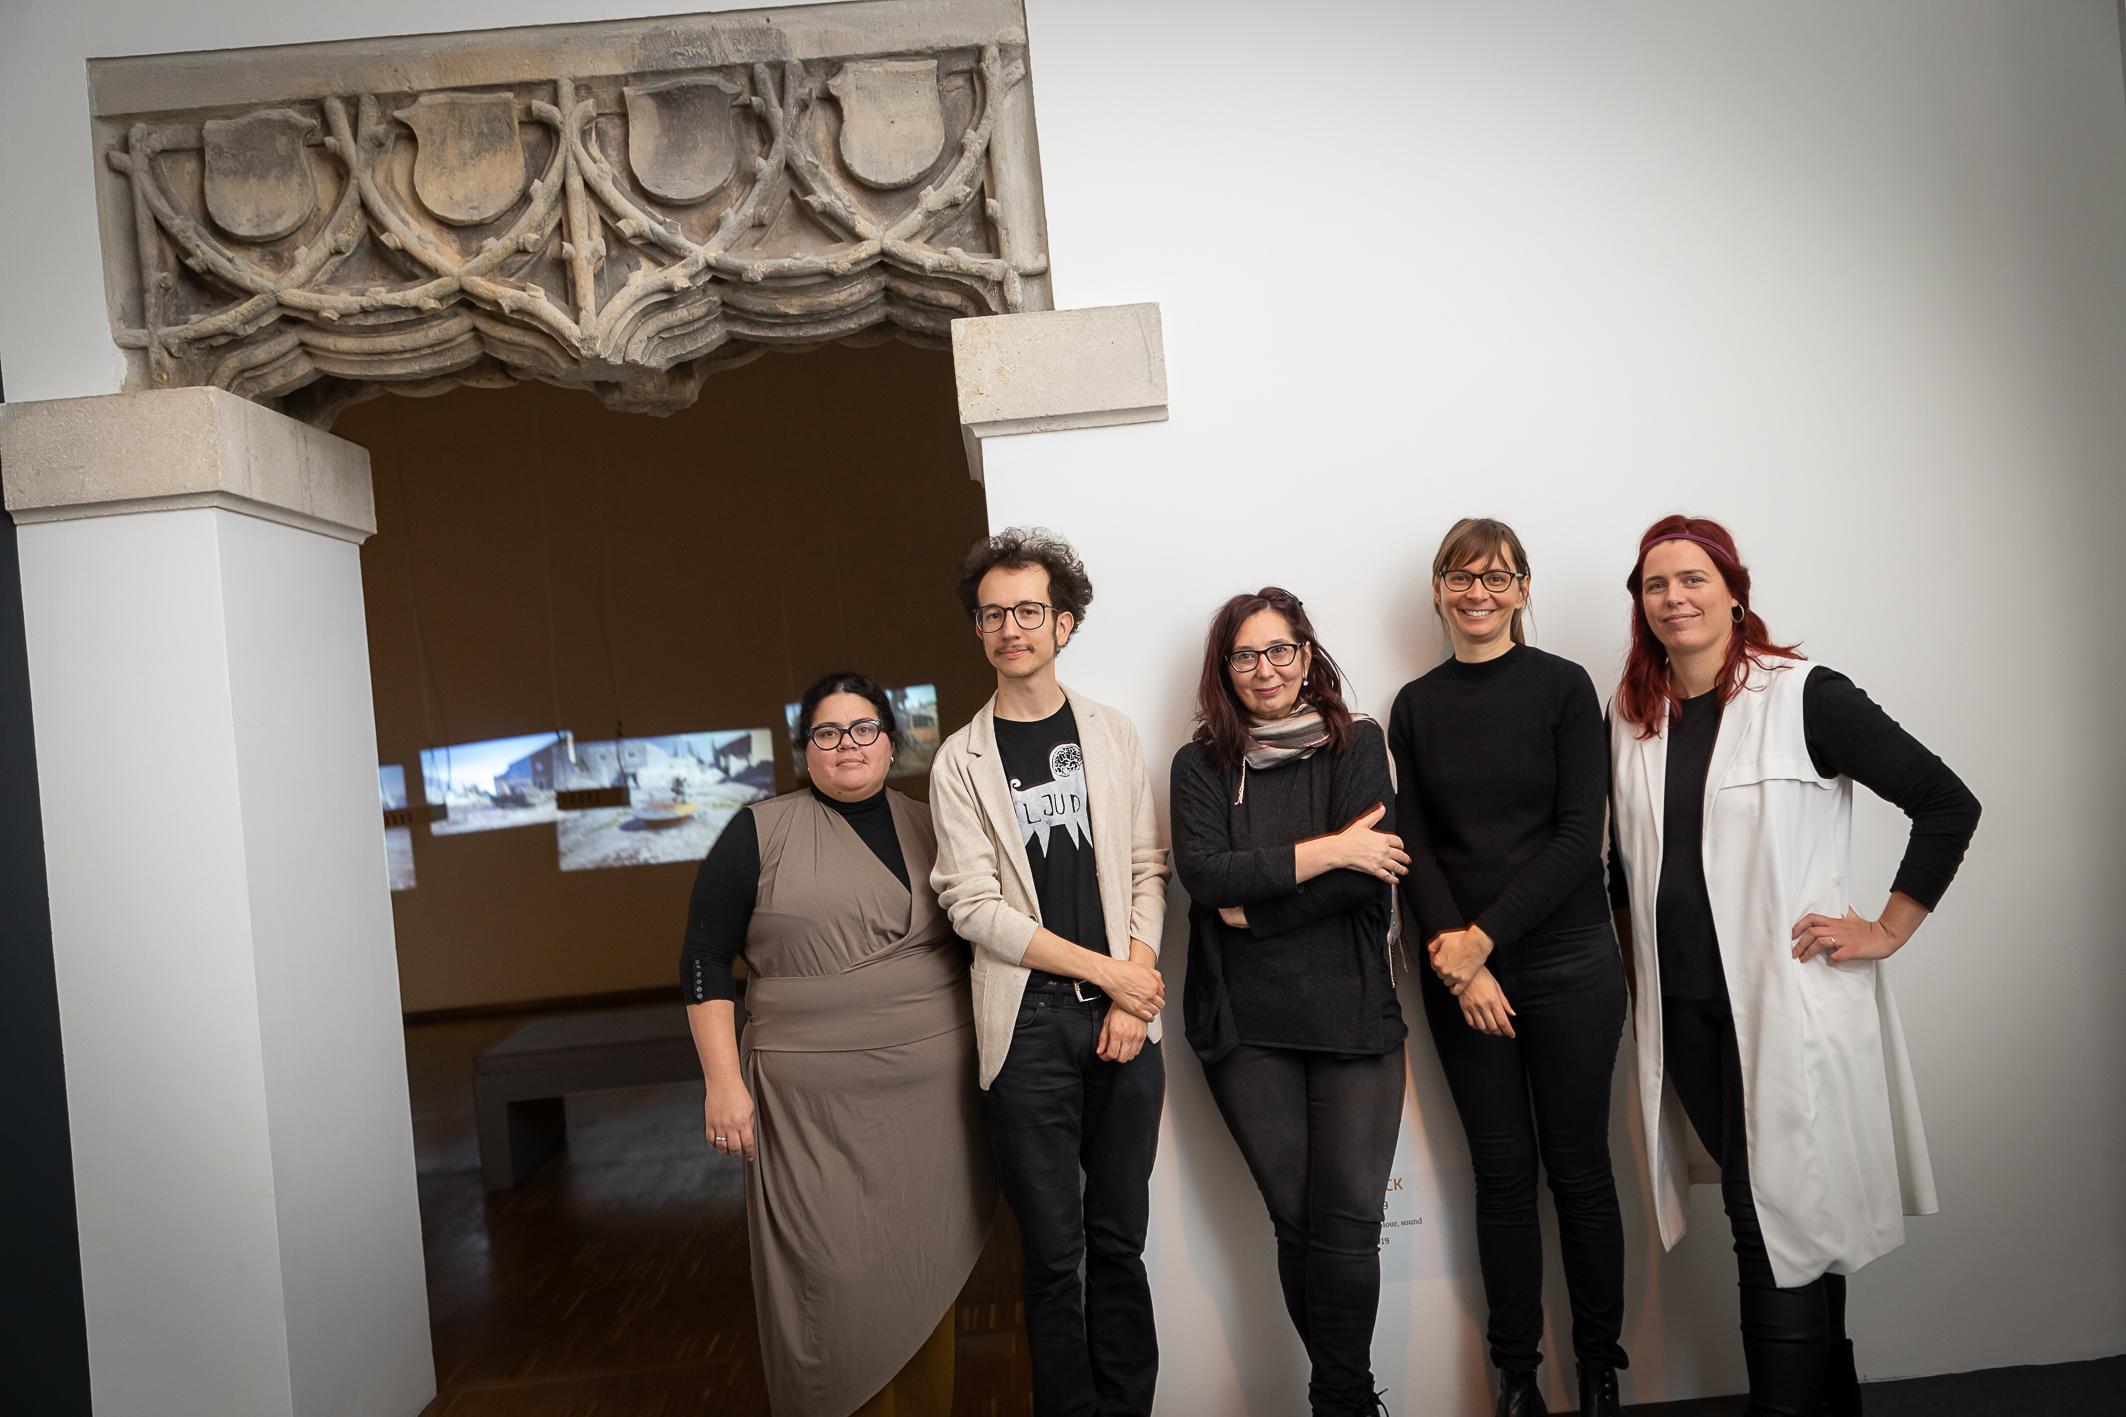 Nayarí Castillo, Robin Klengel (Total Refusal), Kuratorin Radmila Iva Janković, Julia Gaisbacher, Lena Violetta Leitner, Foto: Universalmuseum Joanneum/ N. Lackner